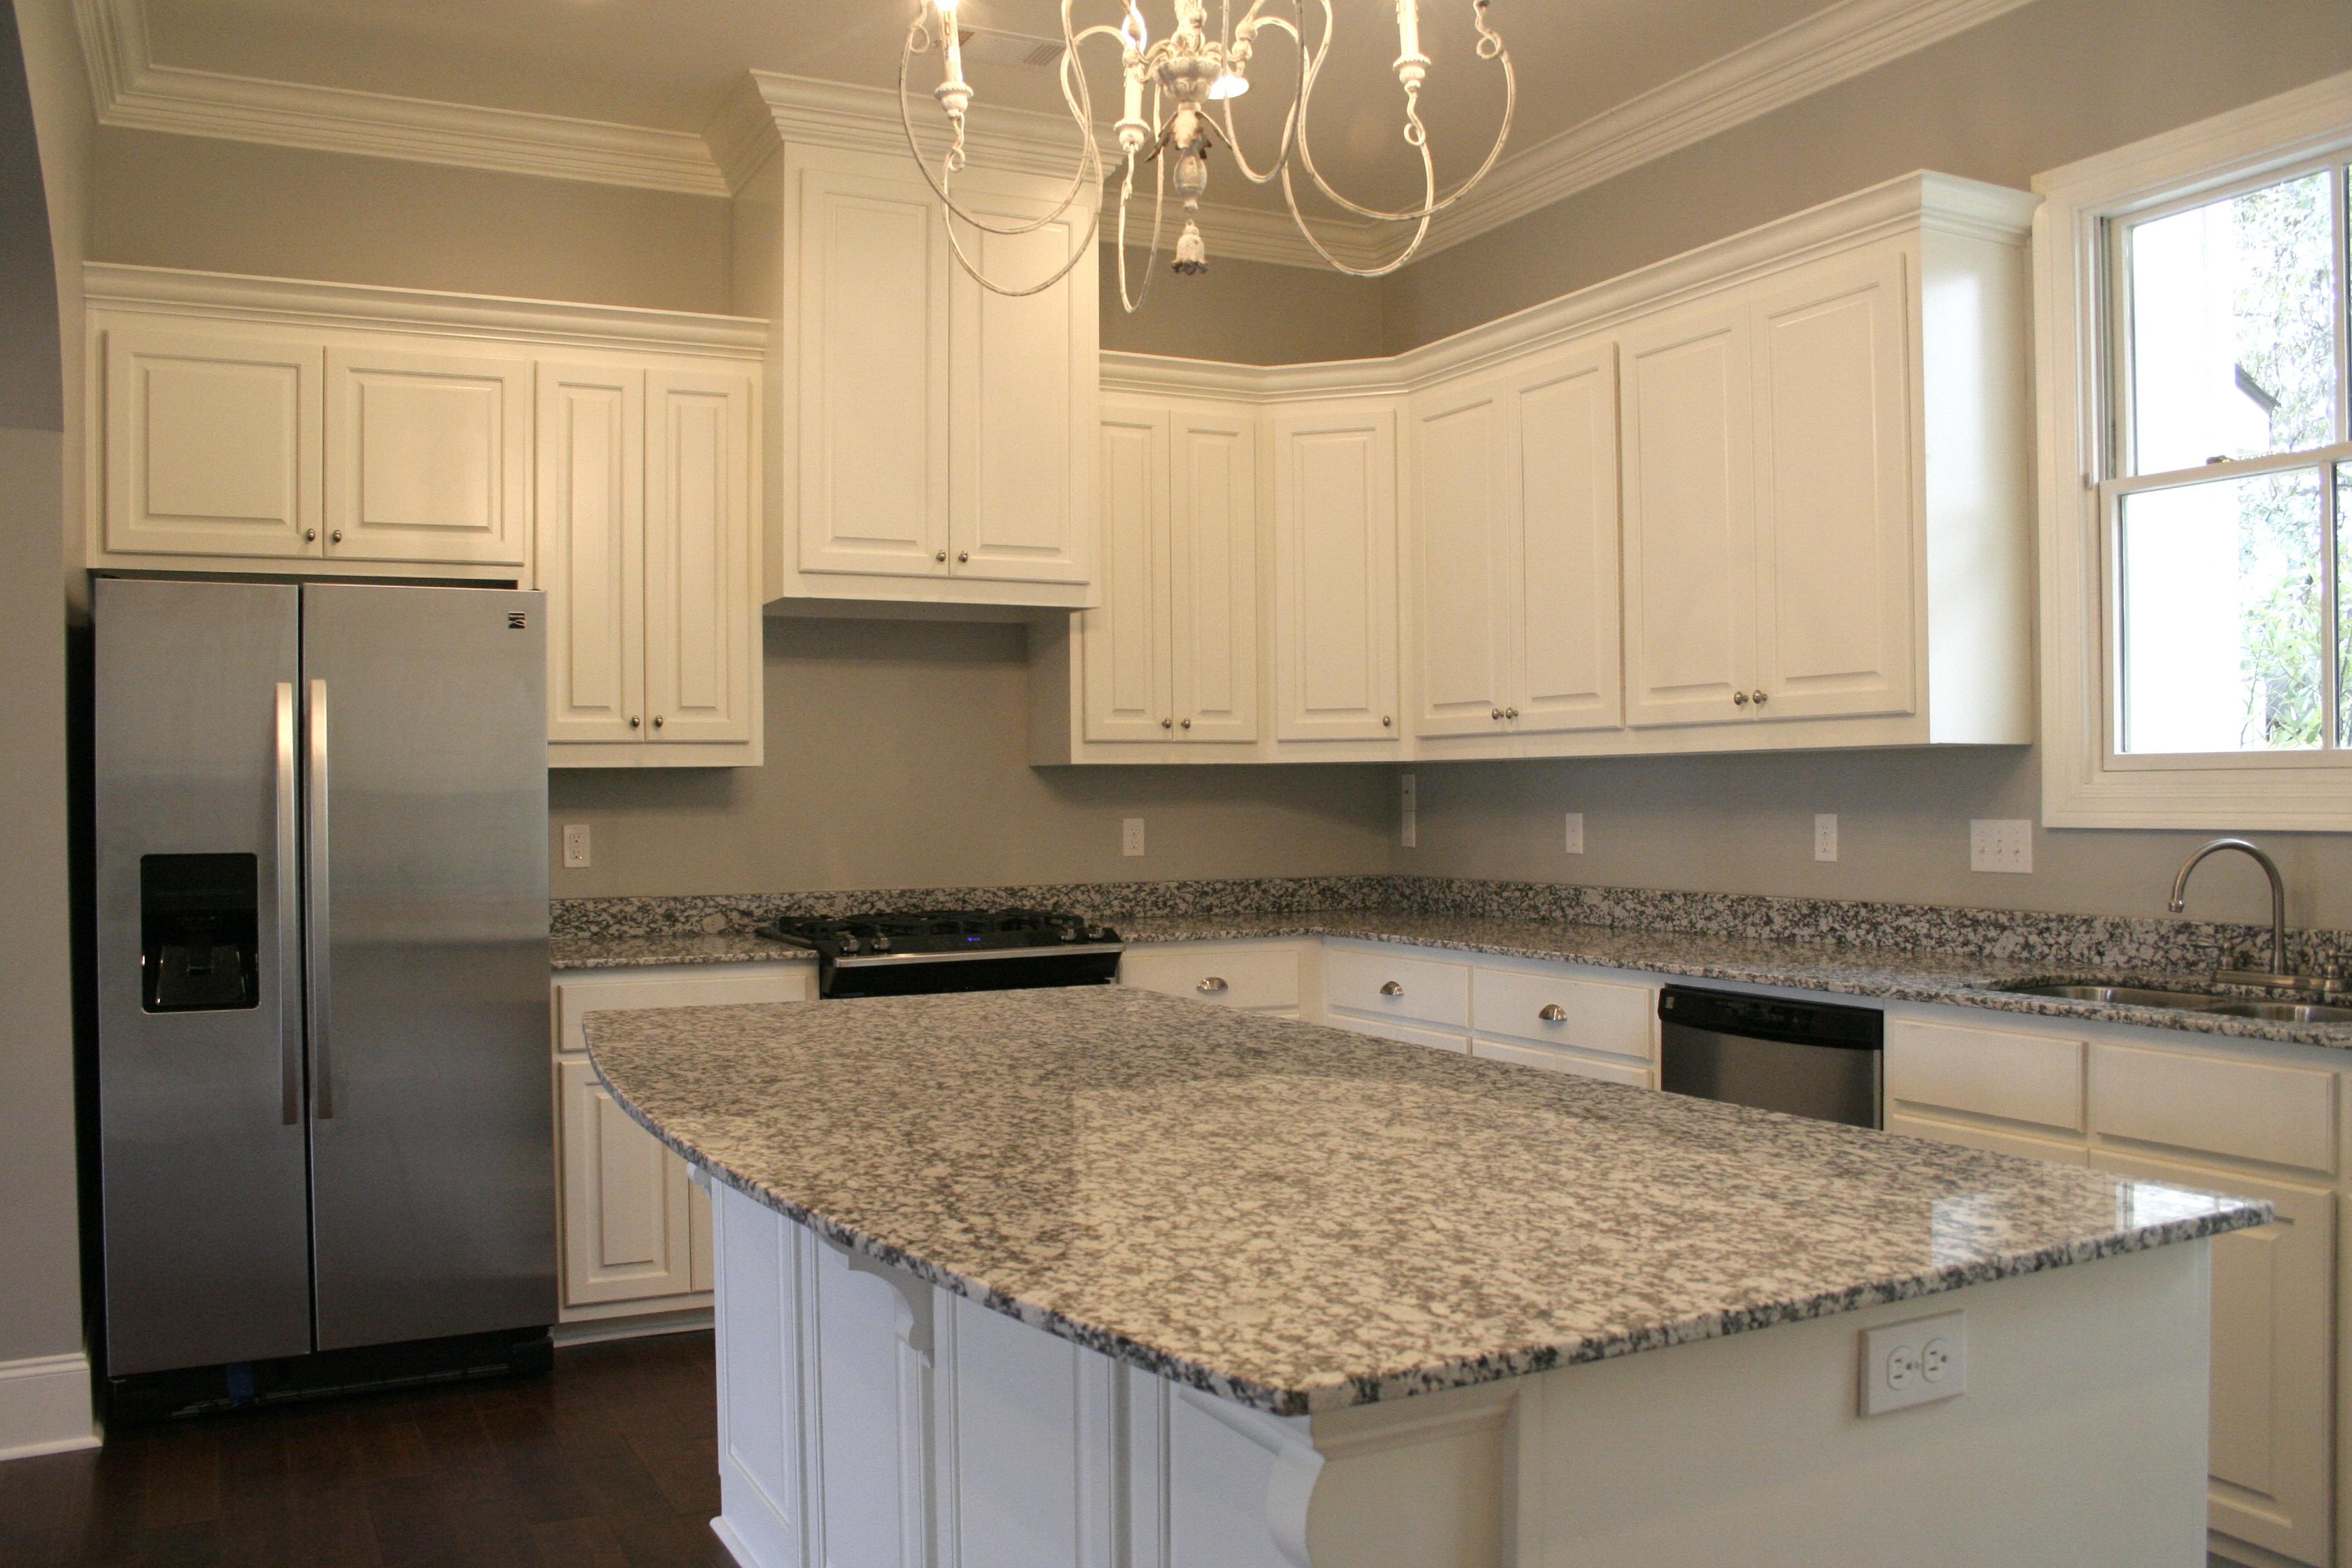 New orleans style kitchen - Exterior Front Unfurnished Kitchen 2